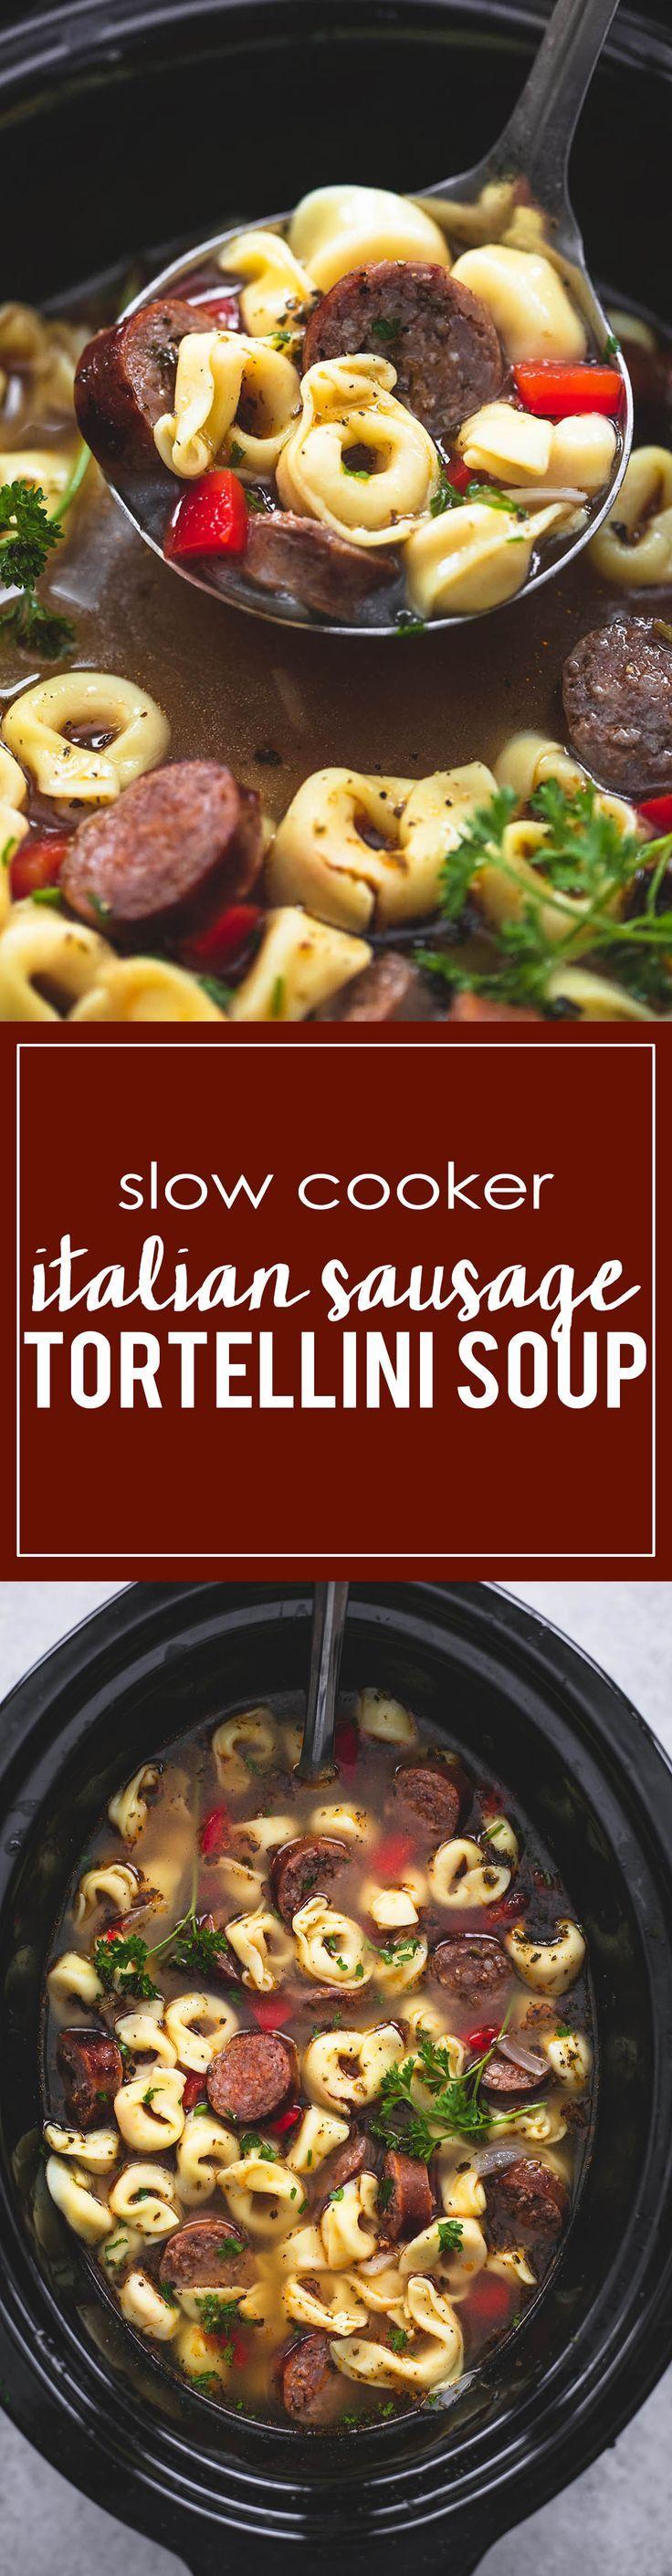 Slow Cooker Italian Sausage Tortellini Soup | http://lecremedelacrumb.com